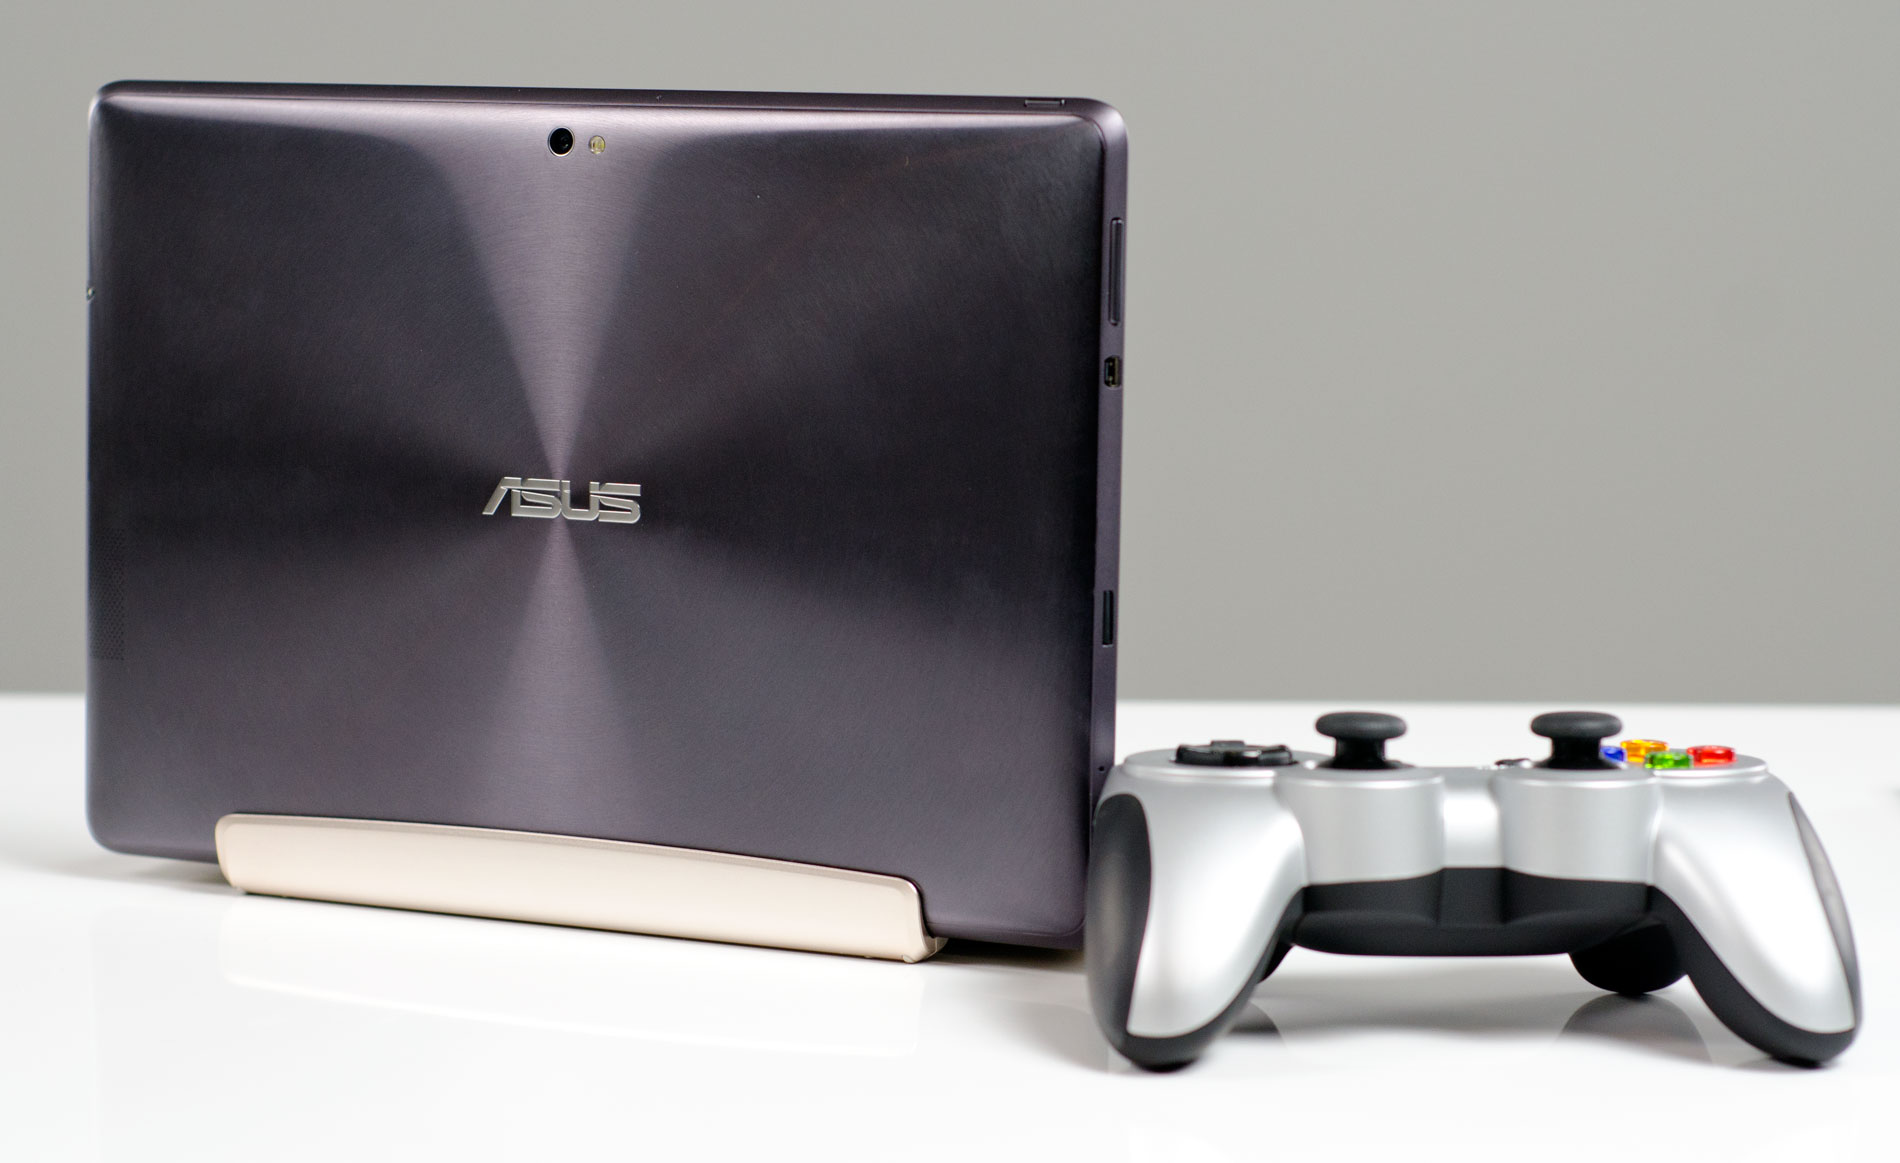 ASUS Eee Pad Transformer Prime Review Part II: Battery Life & More